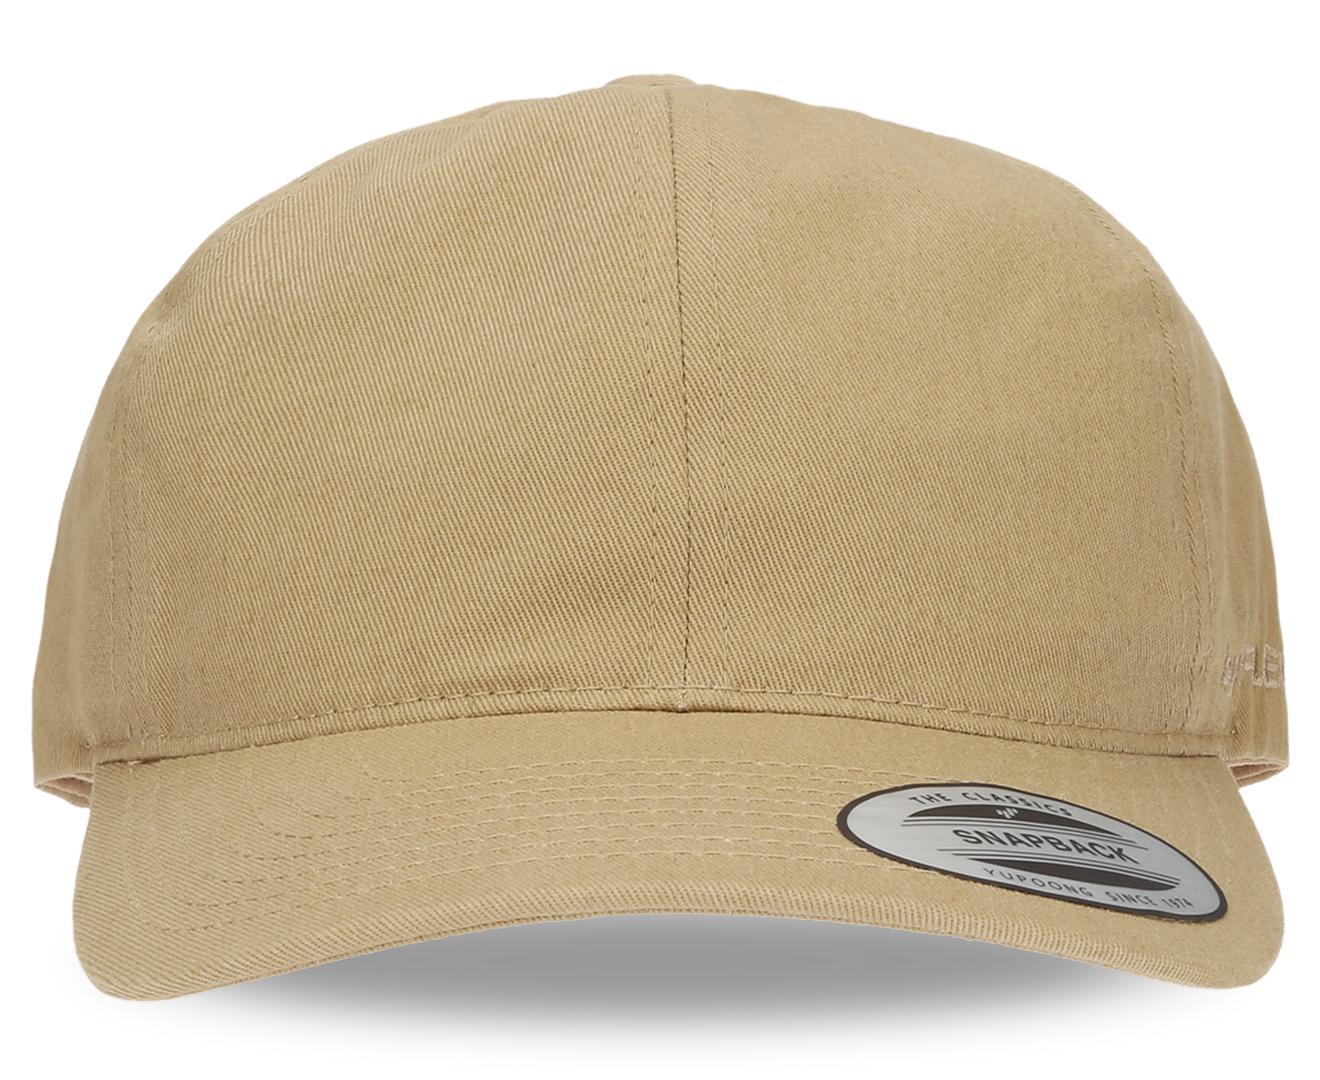 official photos 8bced 06197 Flexfit SV Dad Hat Snapback Cap - Khaki